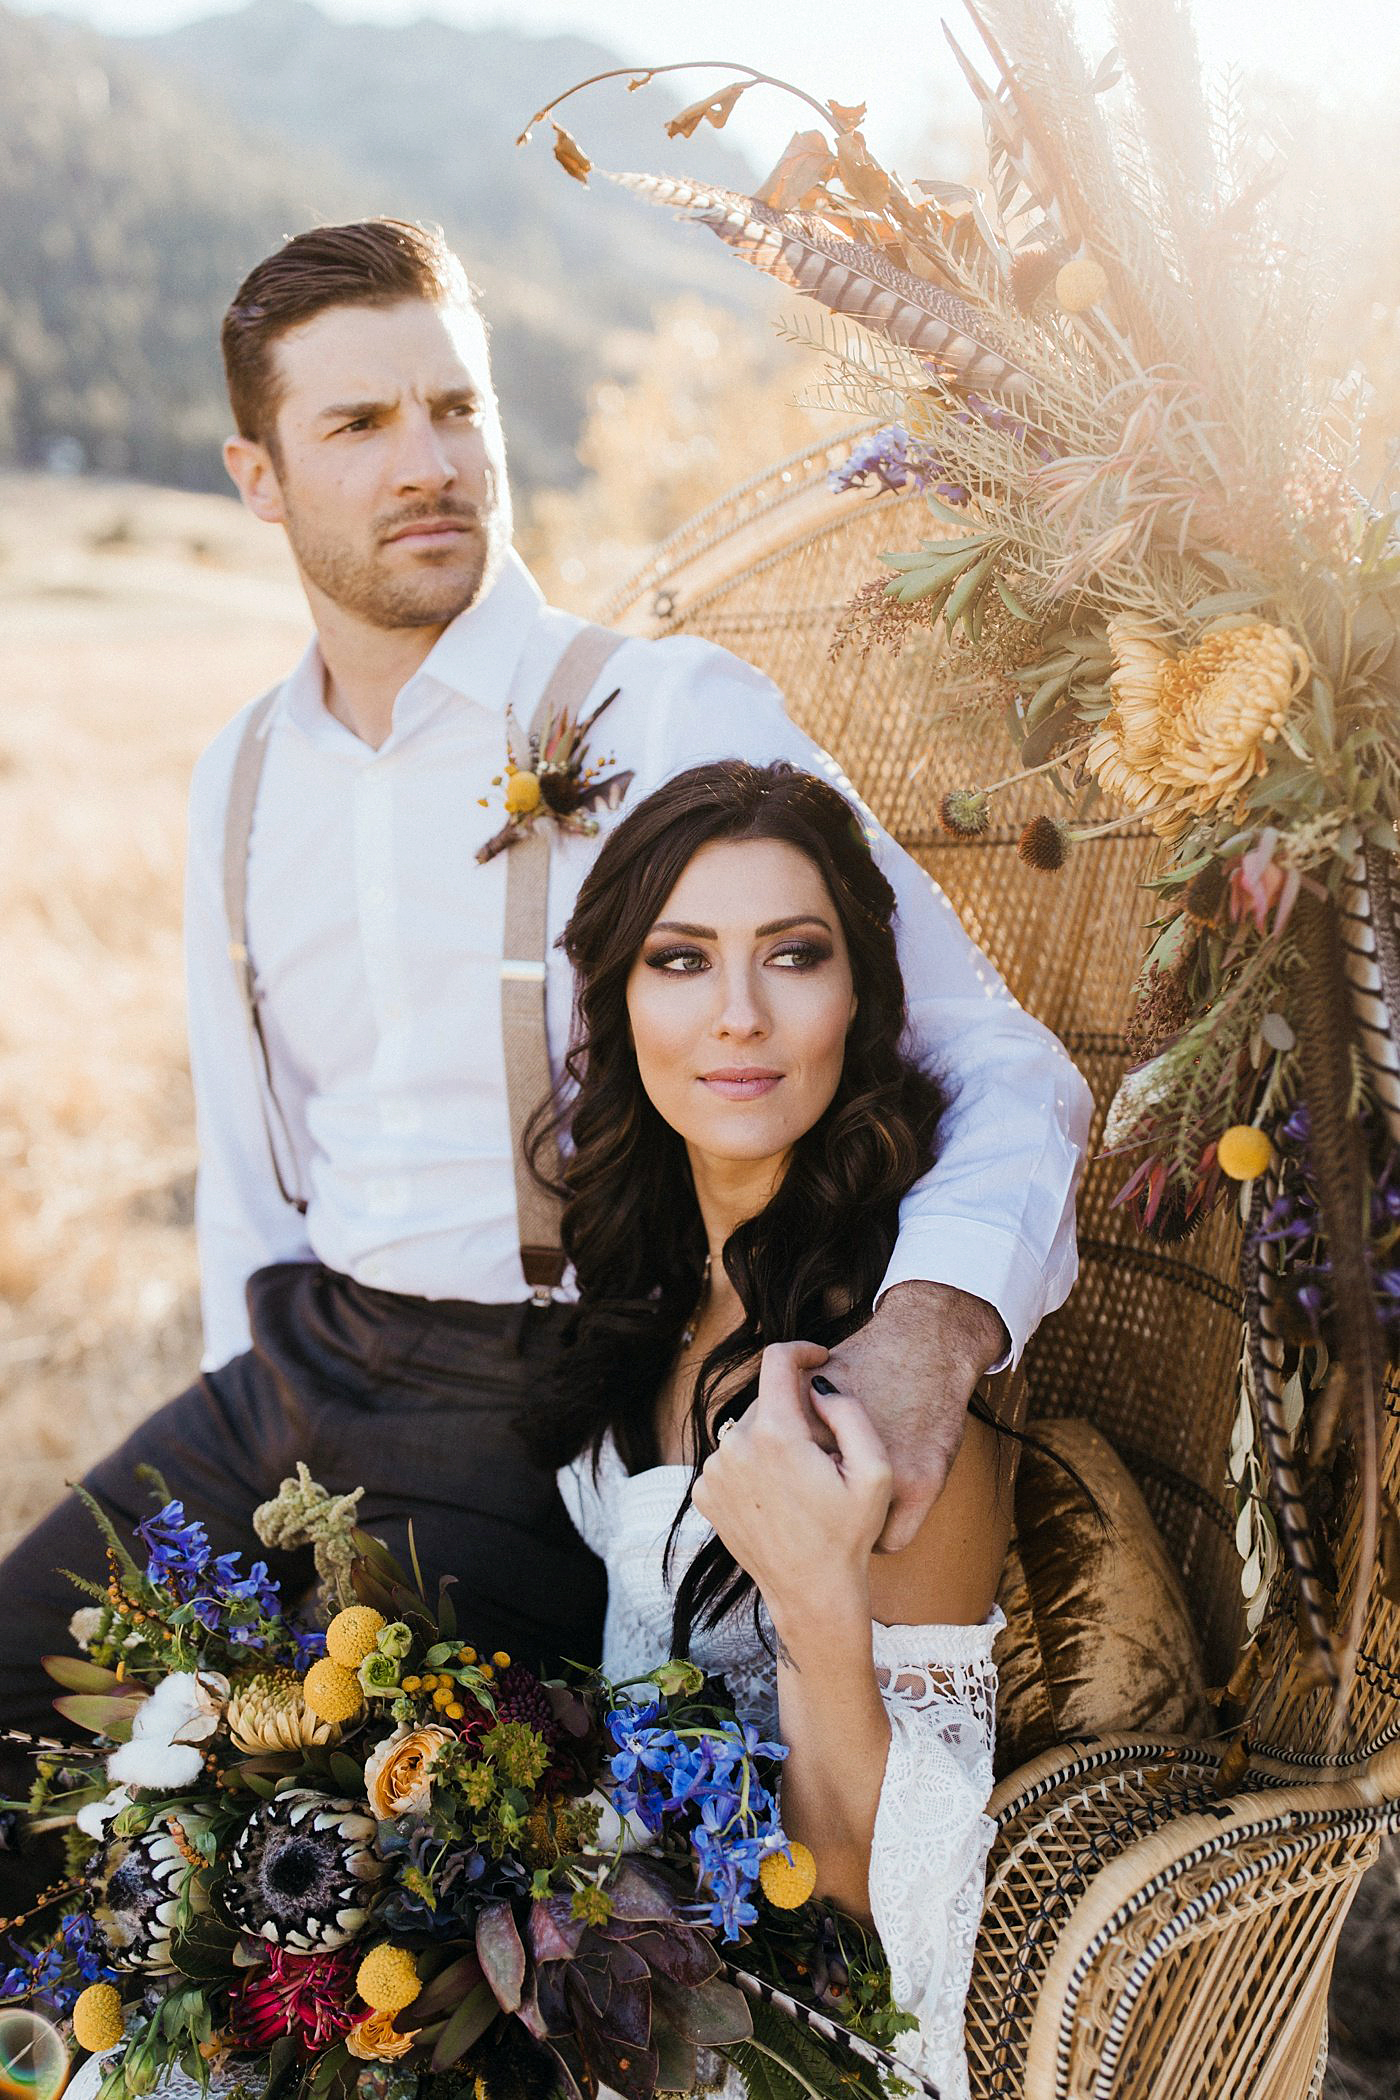 Becca Kufrin Garrett Yrigoyen Pre-Wedding Shoot - The ABC lovebirds are clearly meant to be!